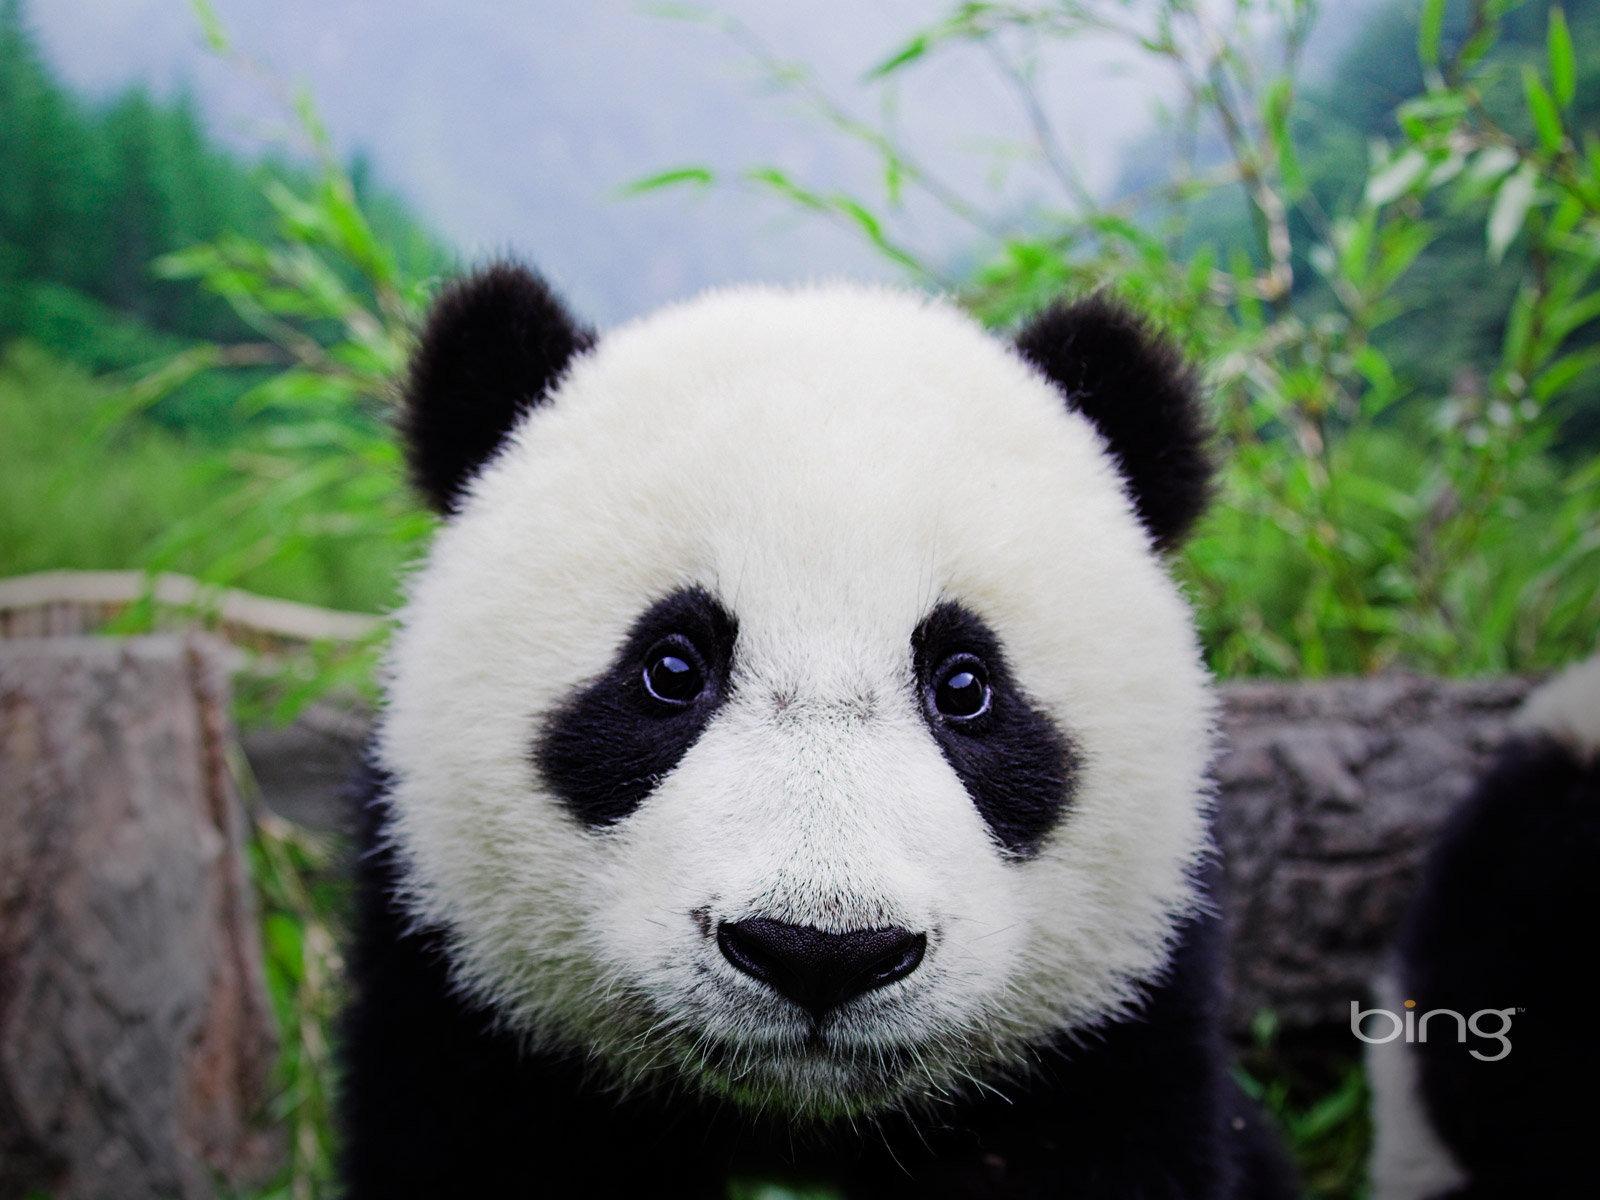 Description Baby panda Wolong Panda Center China Current Size 1600 x 1600x1200